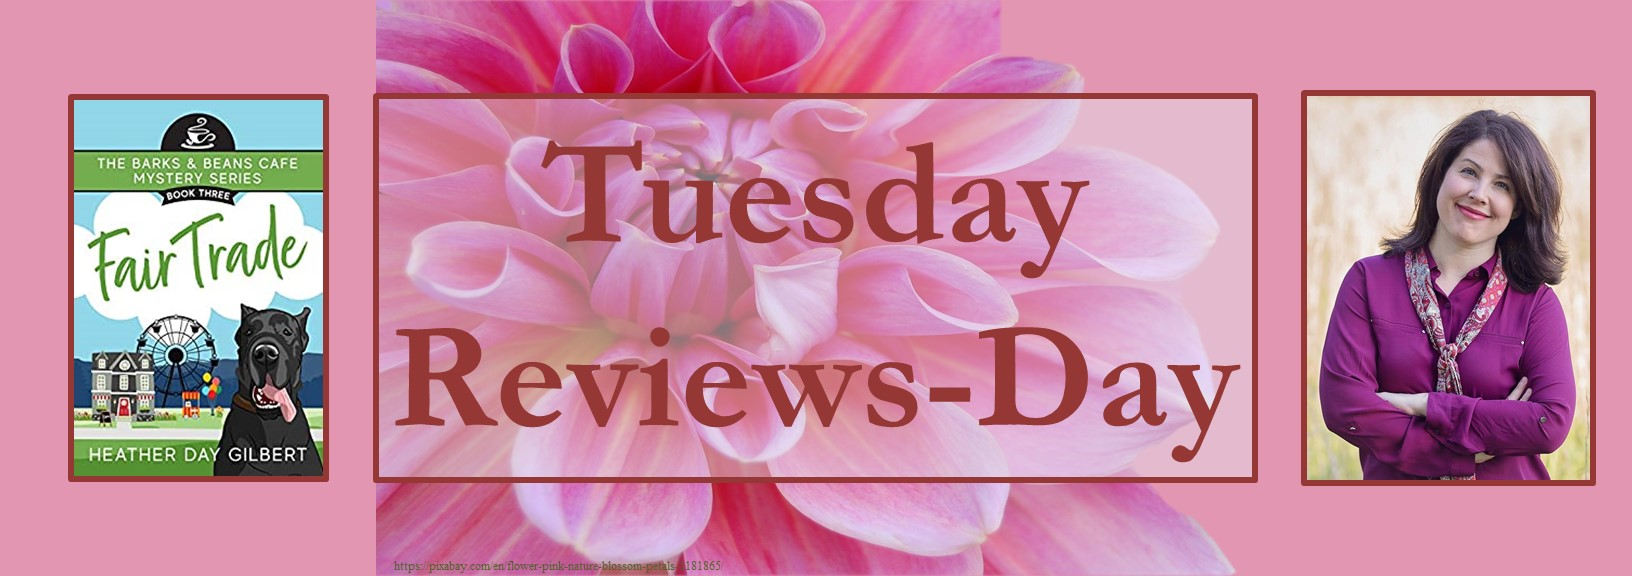 102720- fair trade - tuesday reviews day banner